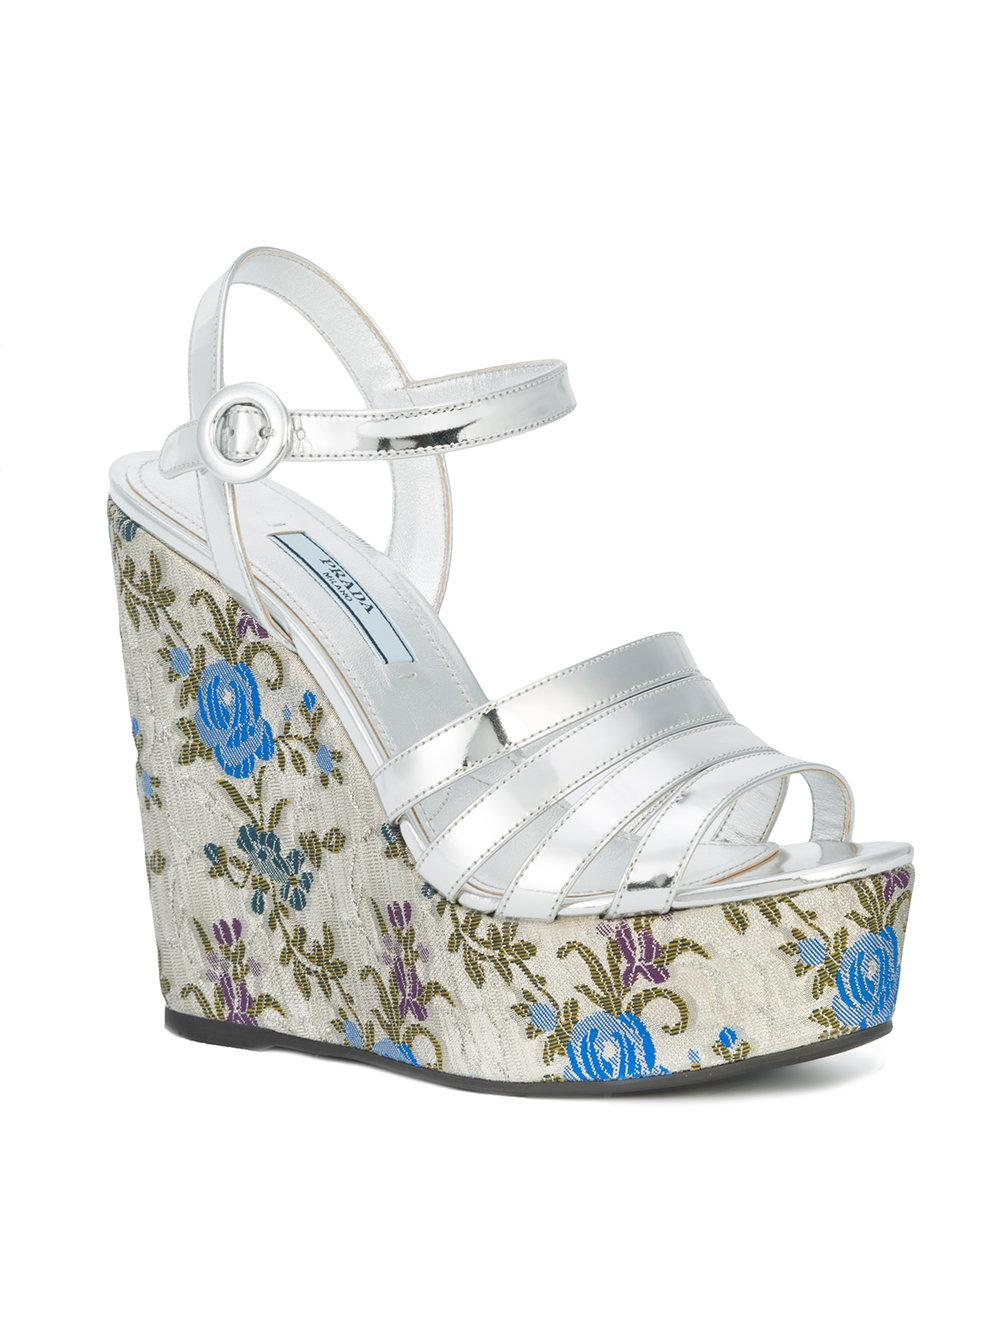 c34979b2cb54 Lyst - Prada Floral Print Wedge Sandals in Metallic